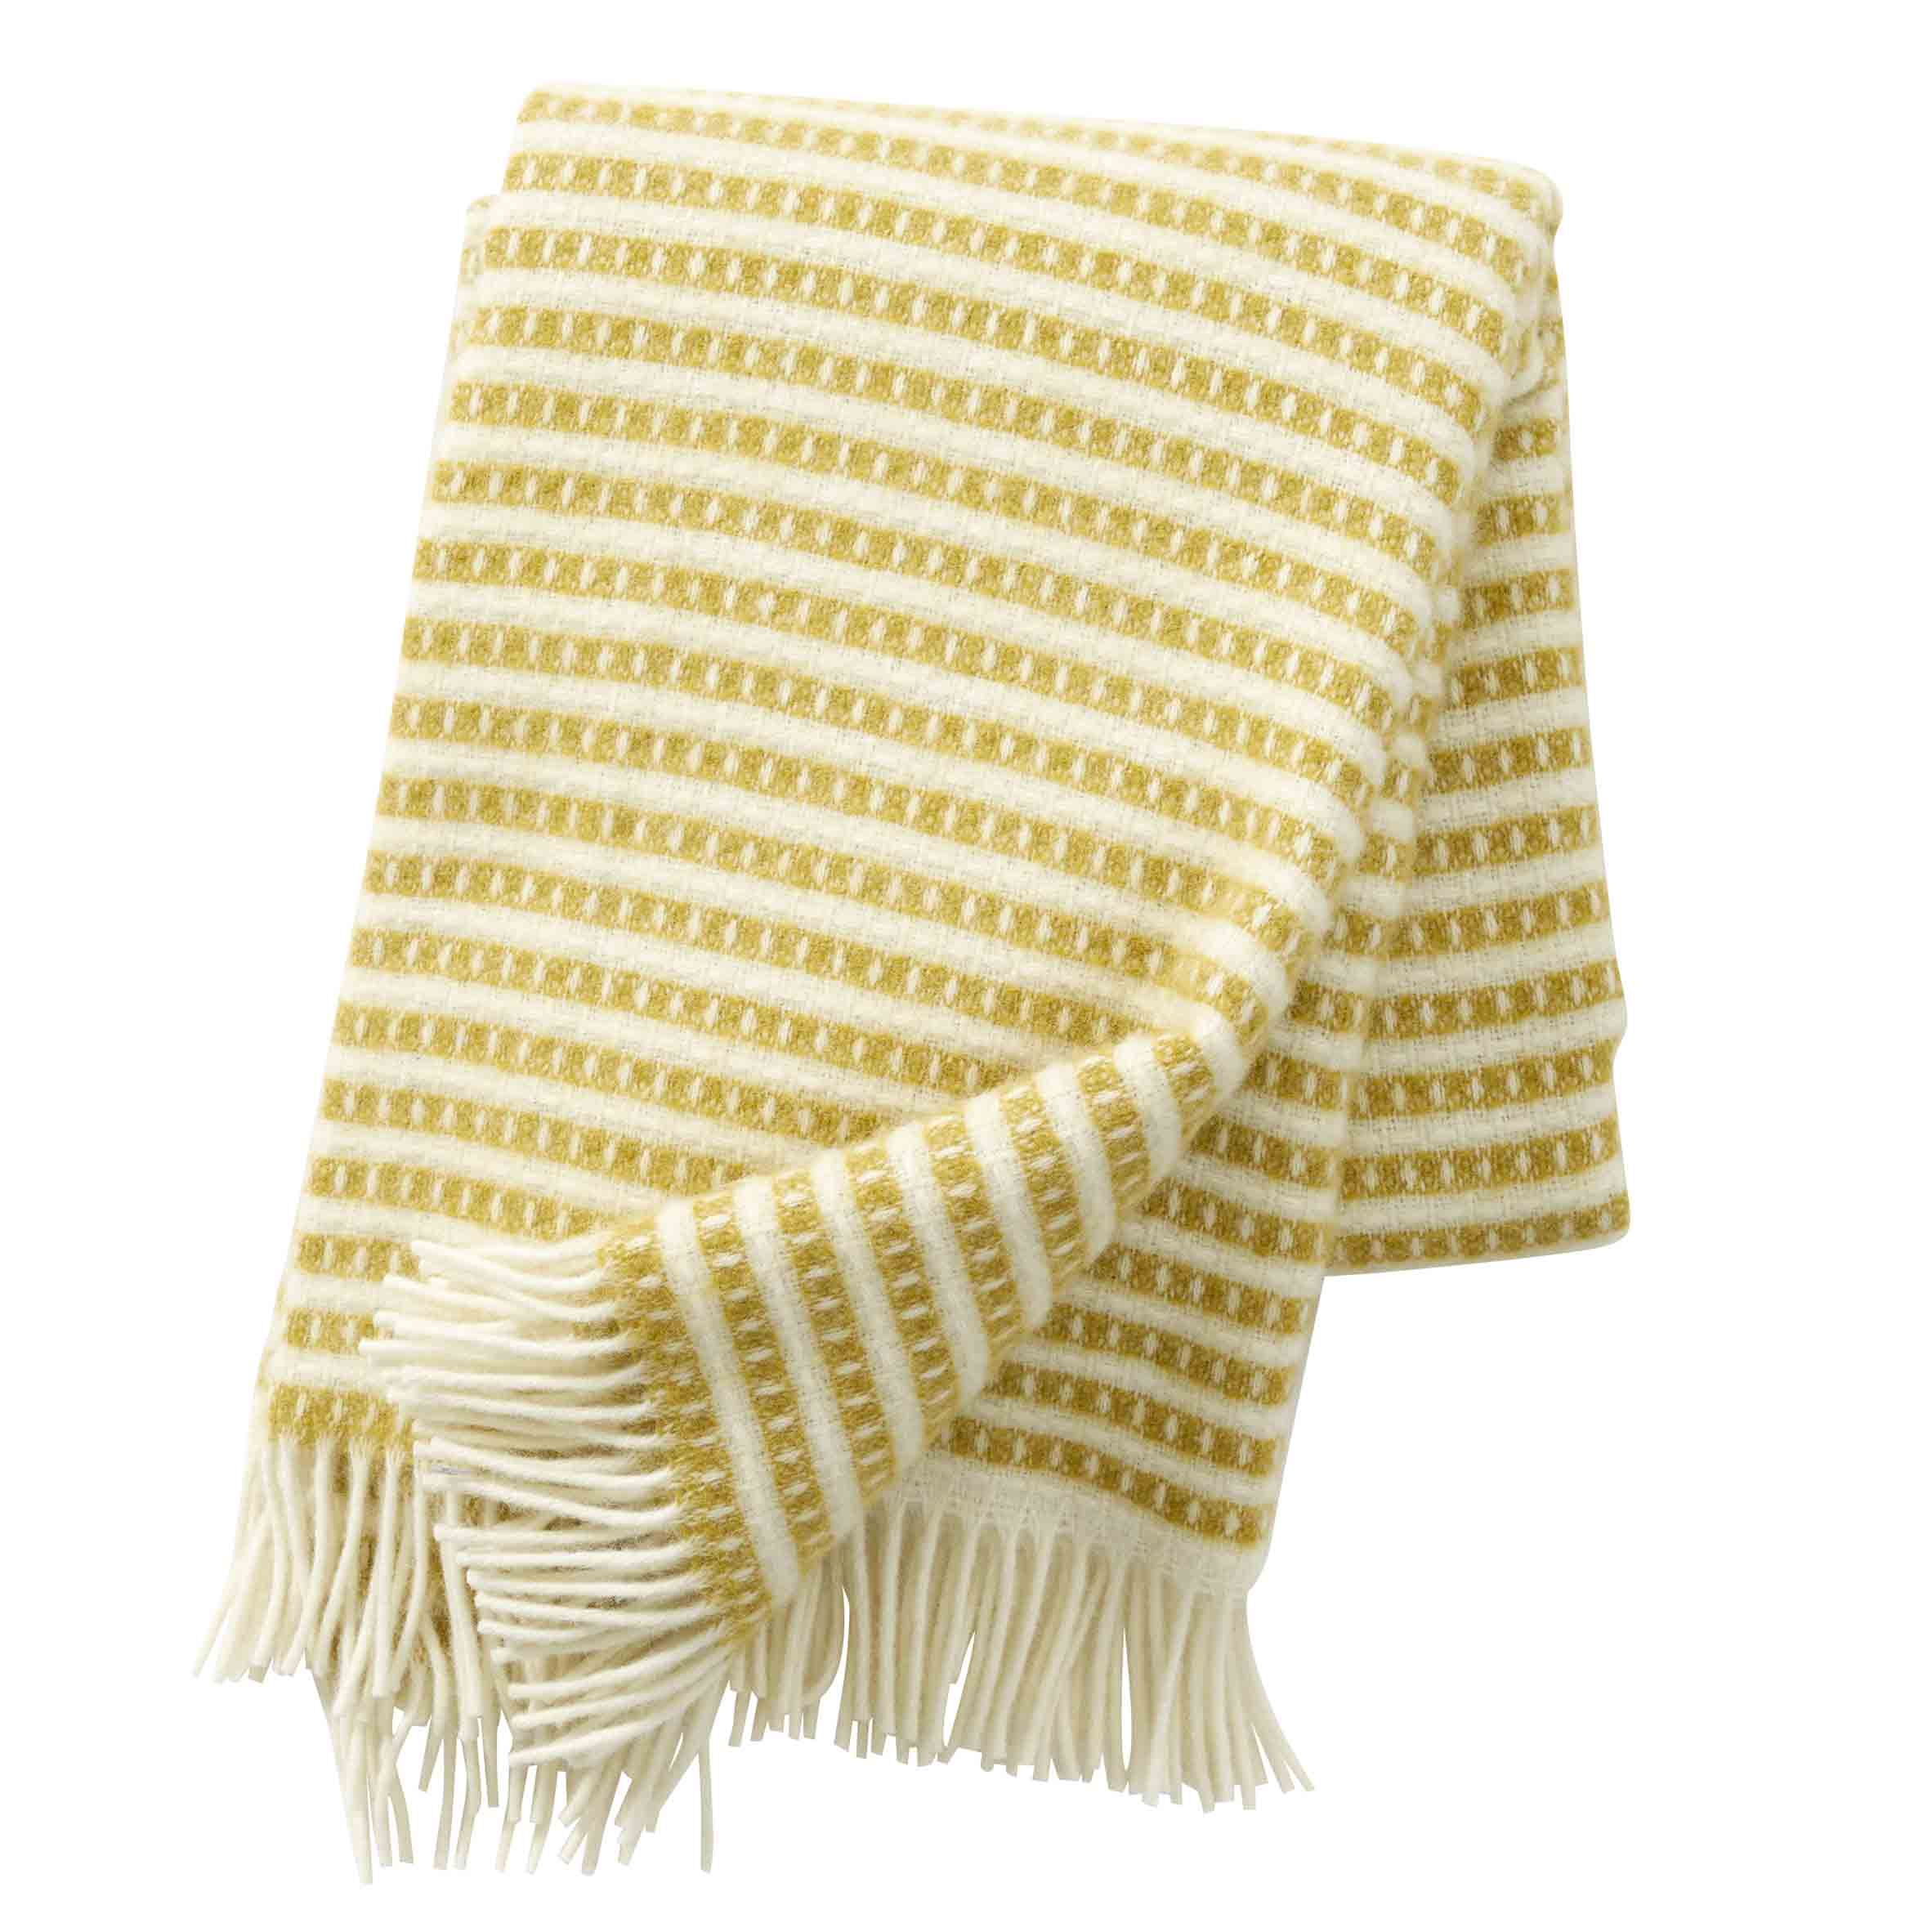 Saffron Olle Blanket, Klippan